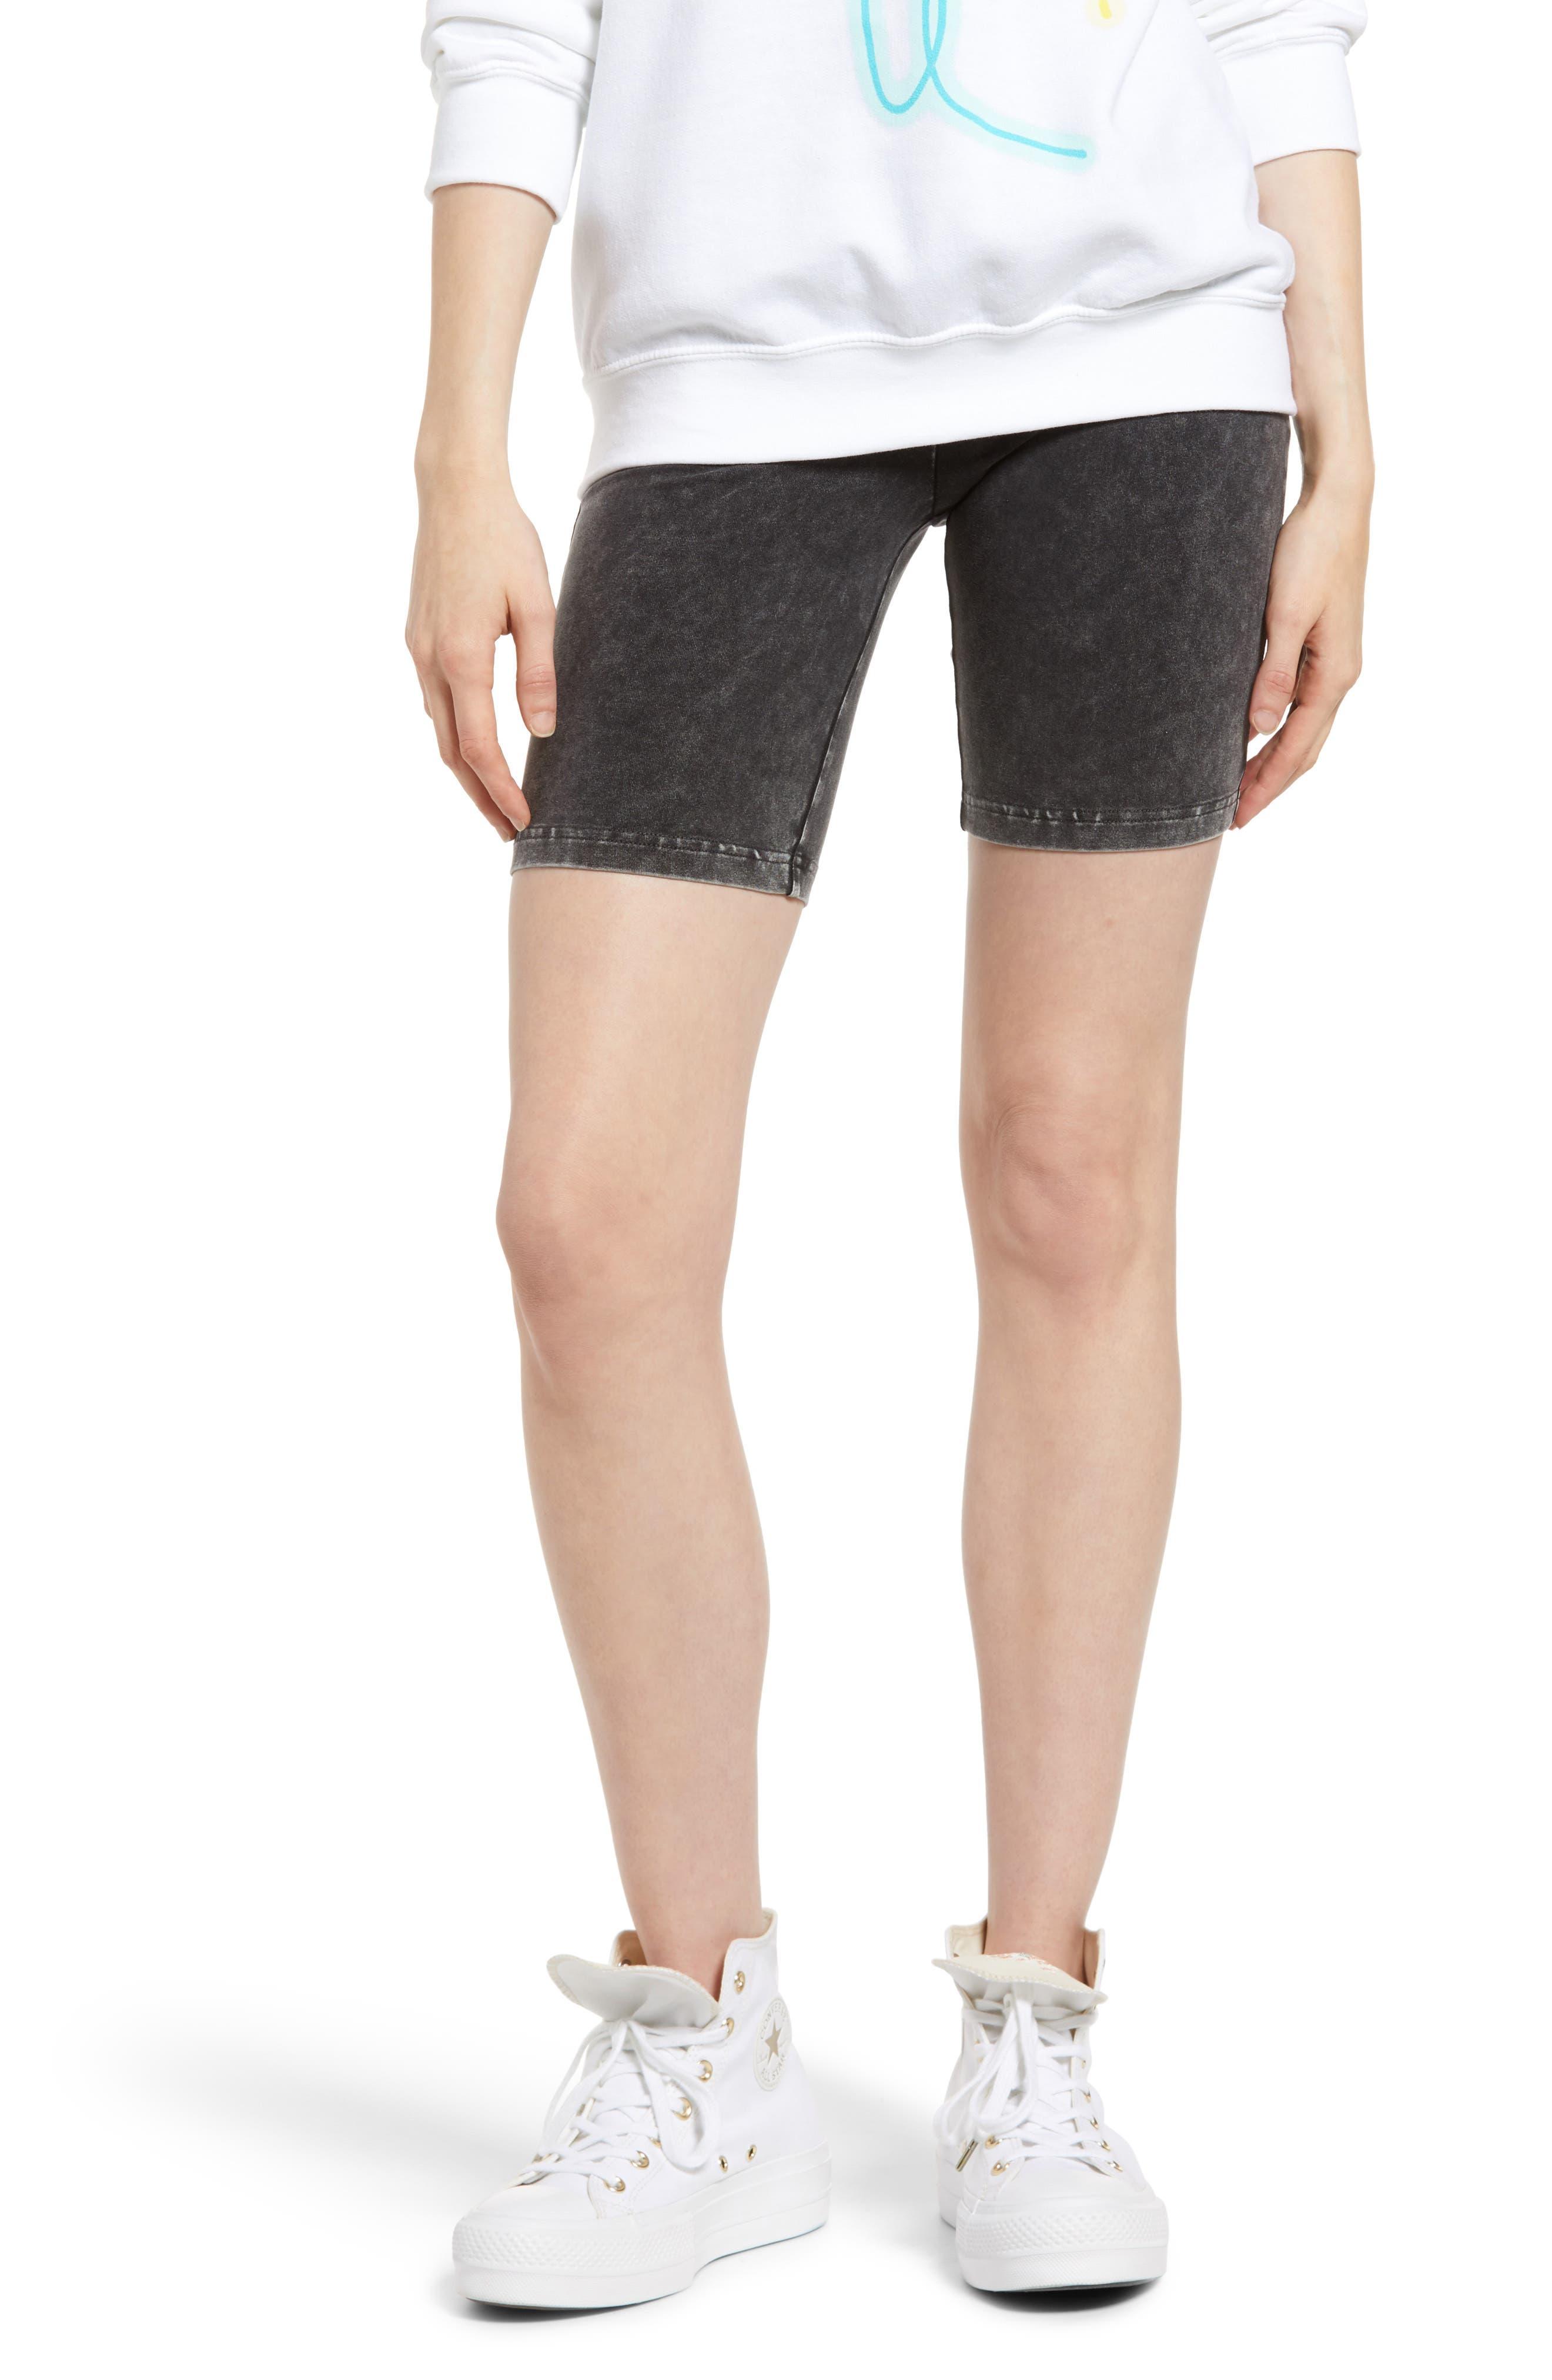 Ten Sixty Sherman Women's Ten Sixty Sherman Washed Bike Shorts, Size Large - Black